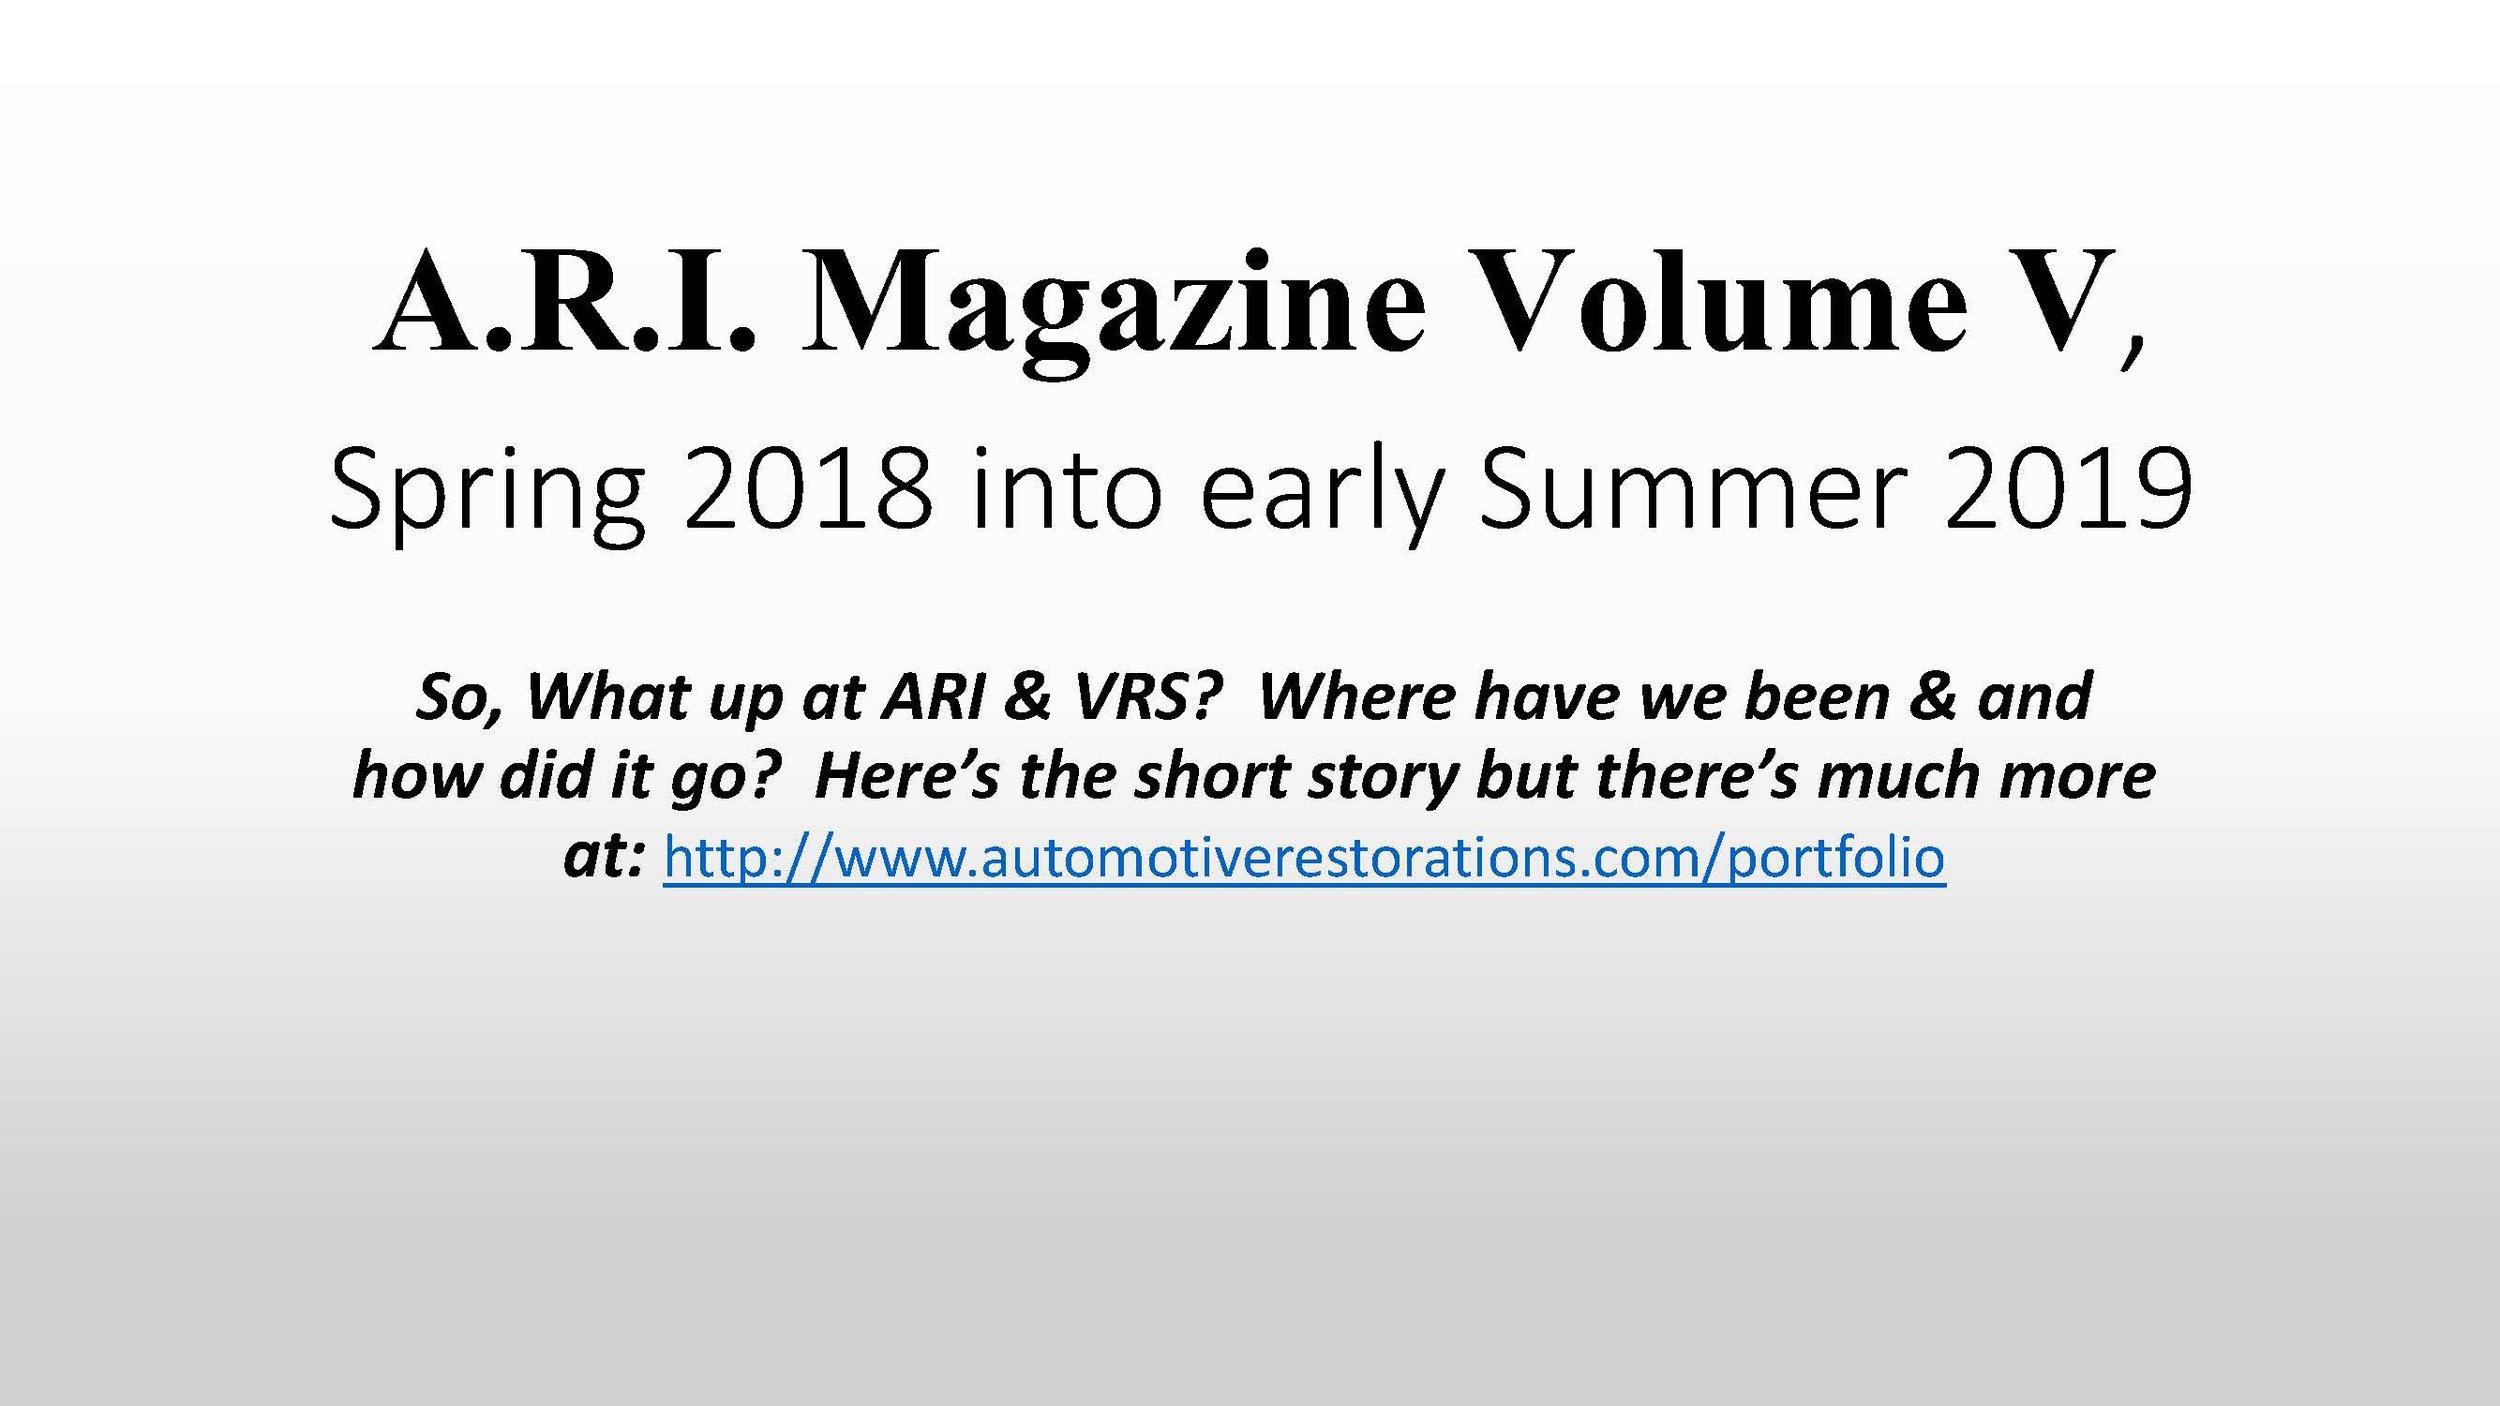 Mag V Late Spring 2018 - erly summer 2019 fnl _Page_01.jpg